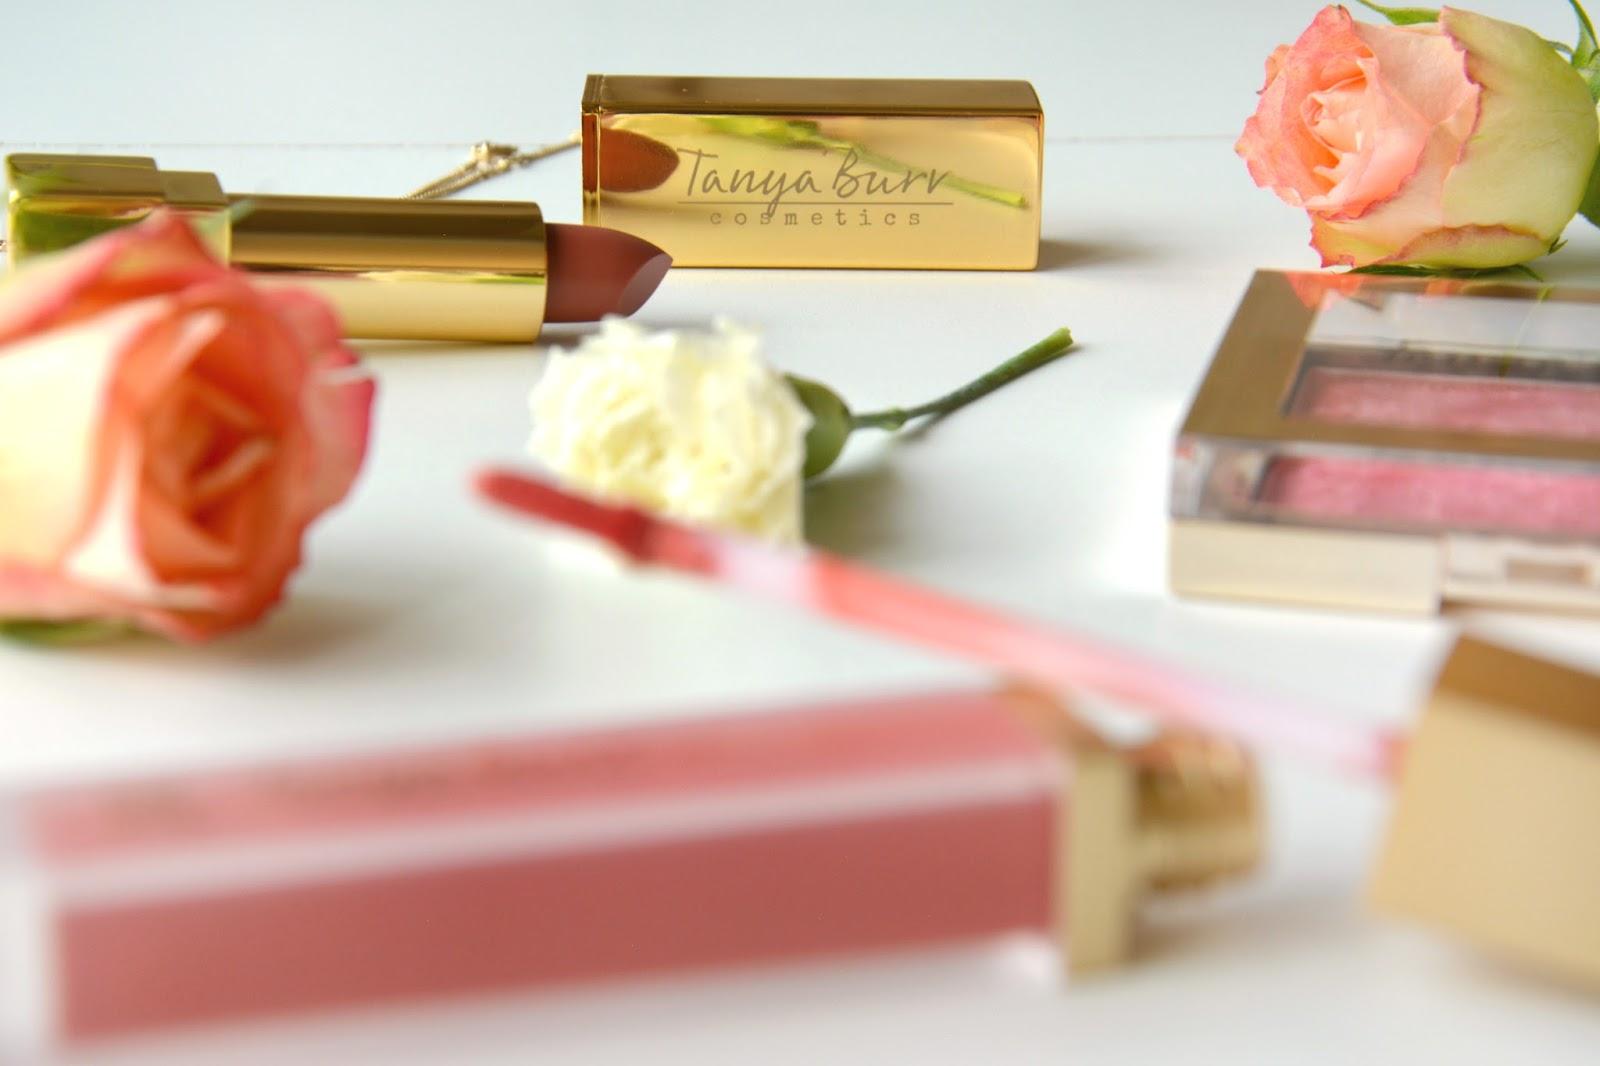 Tanya Burr Cosmetics Lipstick Pink Cocoa; Tanya Burr Cosmetics Soft Luxe Lip Gloss Martha Moo;Tanya Burr Cosmetics Illuminating Powder Peonies Please